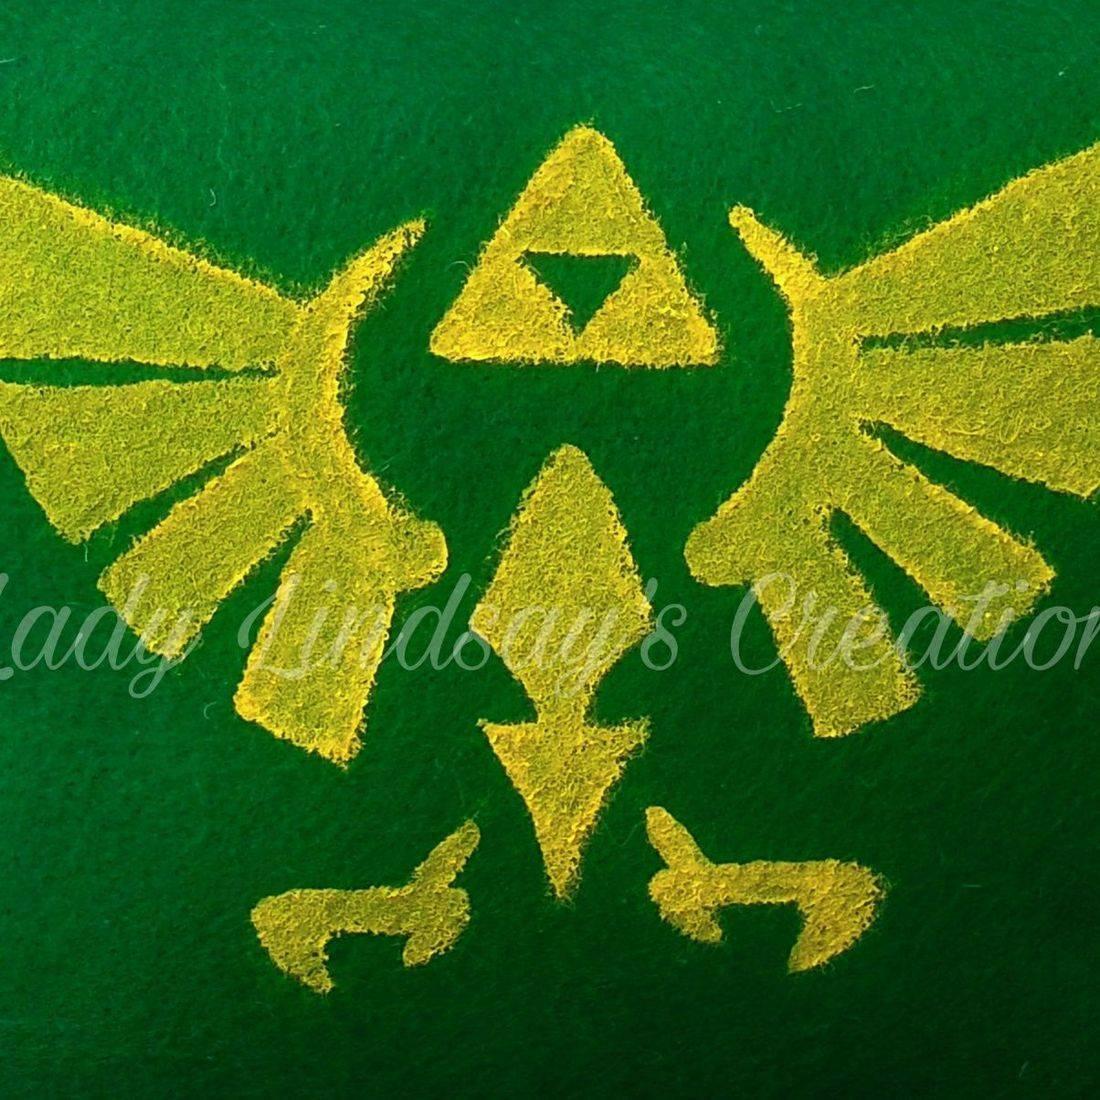 Legend of Zelda, Hyrule, Crest, painted, pillow, handmade, handcrafted, shop small, small business, Link, Nintendo, video game, Classic, Nerd, geek, otaku, anime